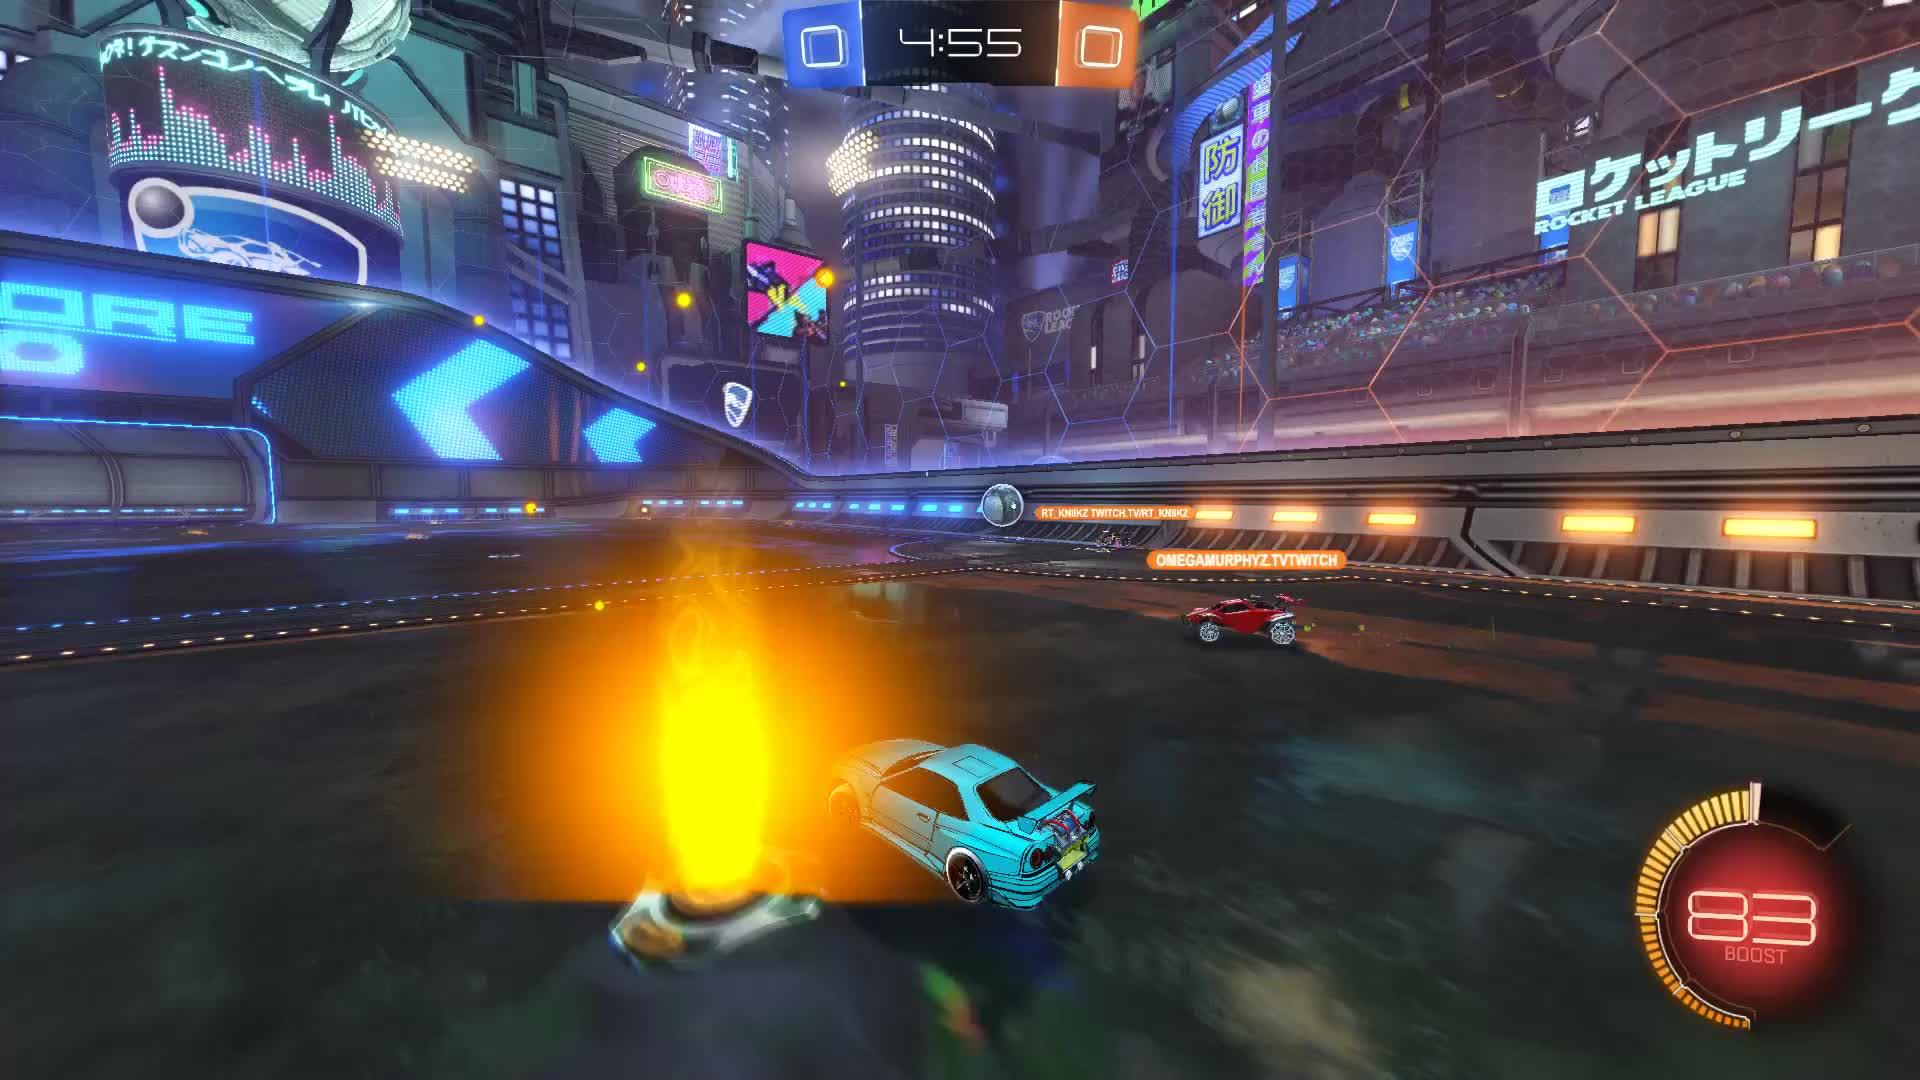 CJ, Gif Your Game, GifYourGame, Rocket League, RocketLeague, Save, Save 1: CJ GIFs